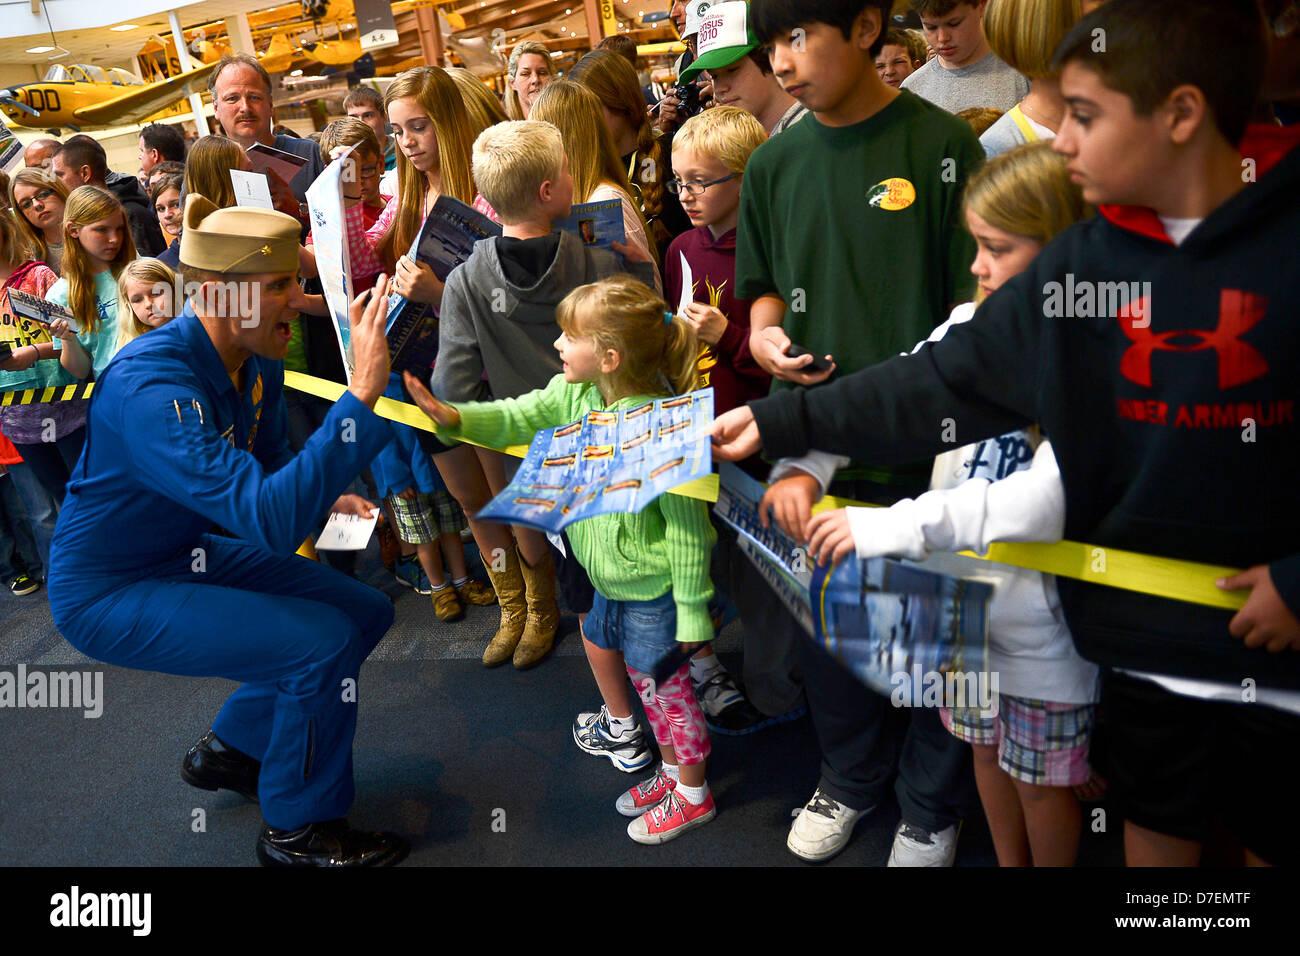 Blue Angels pilots meet fans. Stock Photo